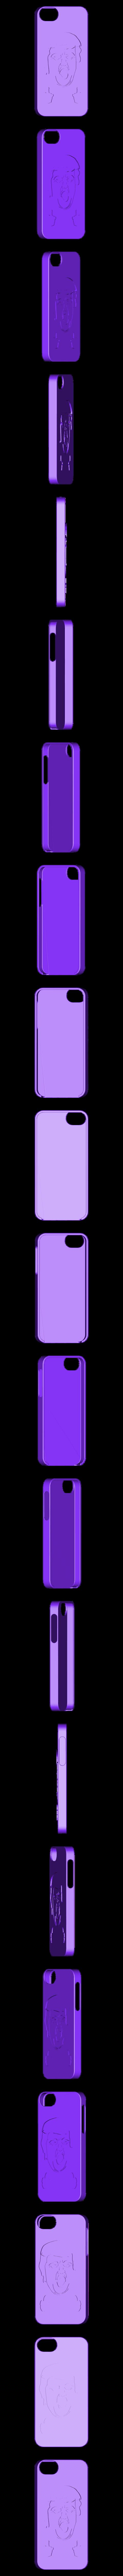 trump.stl Download OBJ file Trump fuck yeah iphone 5 case • 3D printing template, Ukiyograph